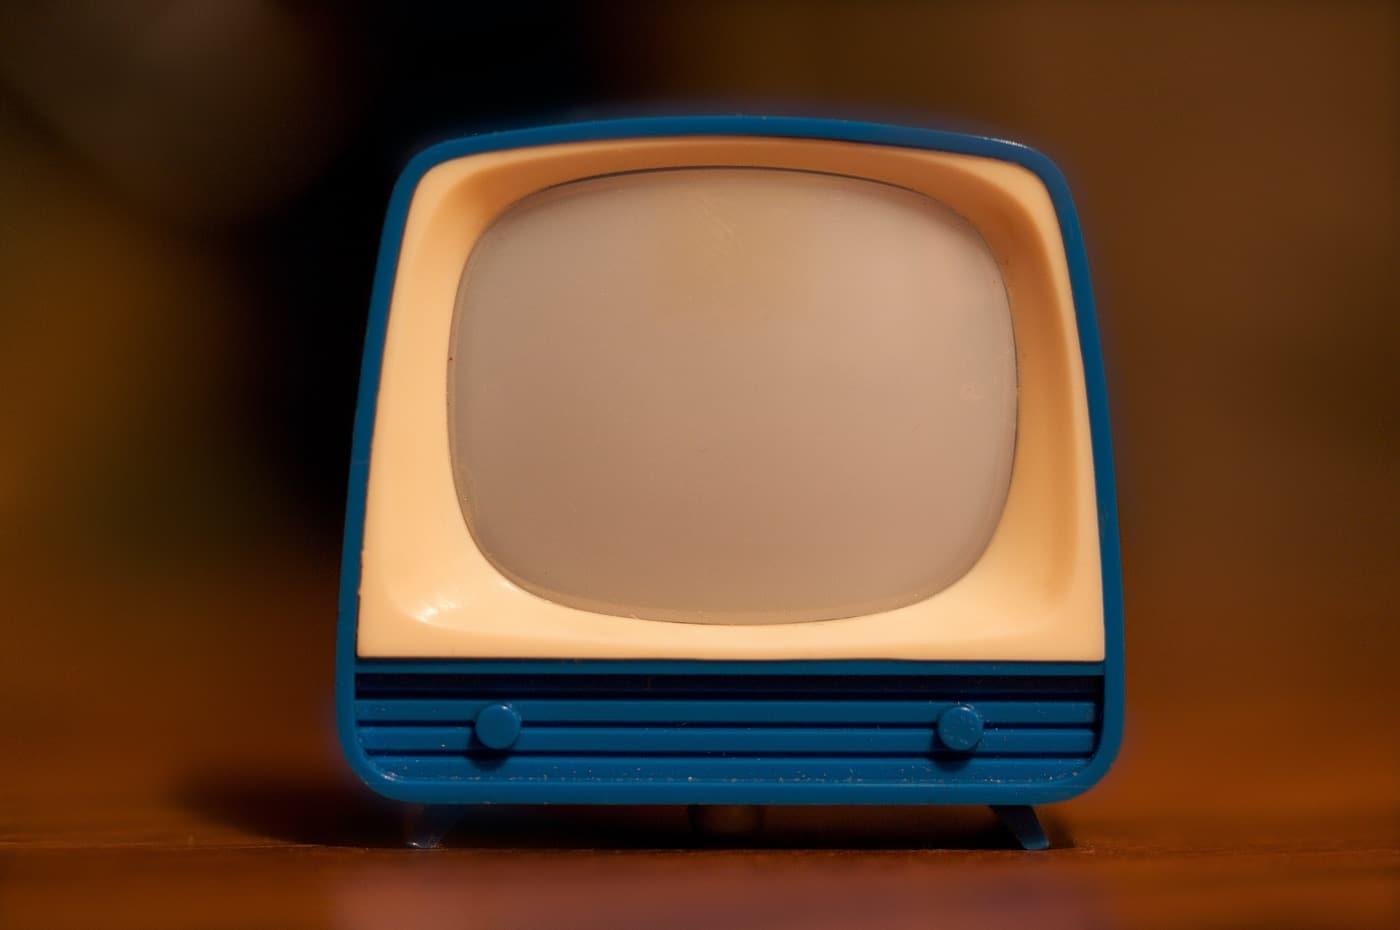 choisir taille tv